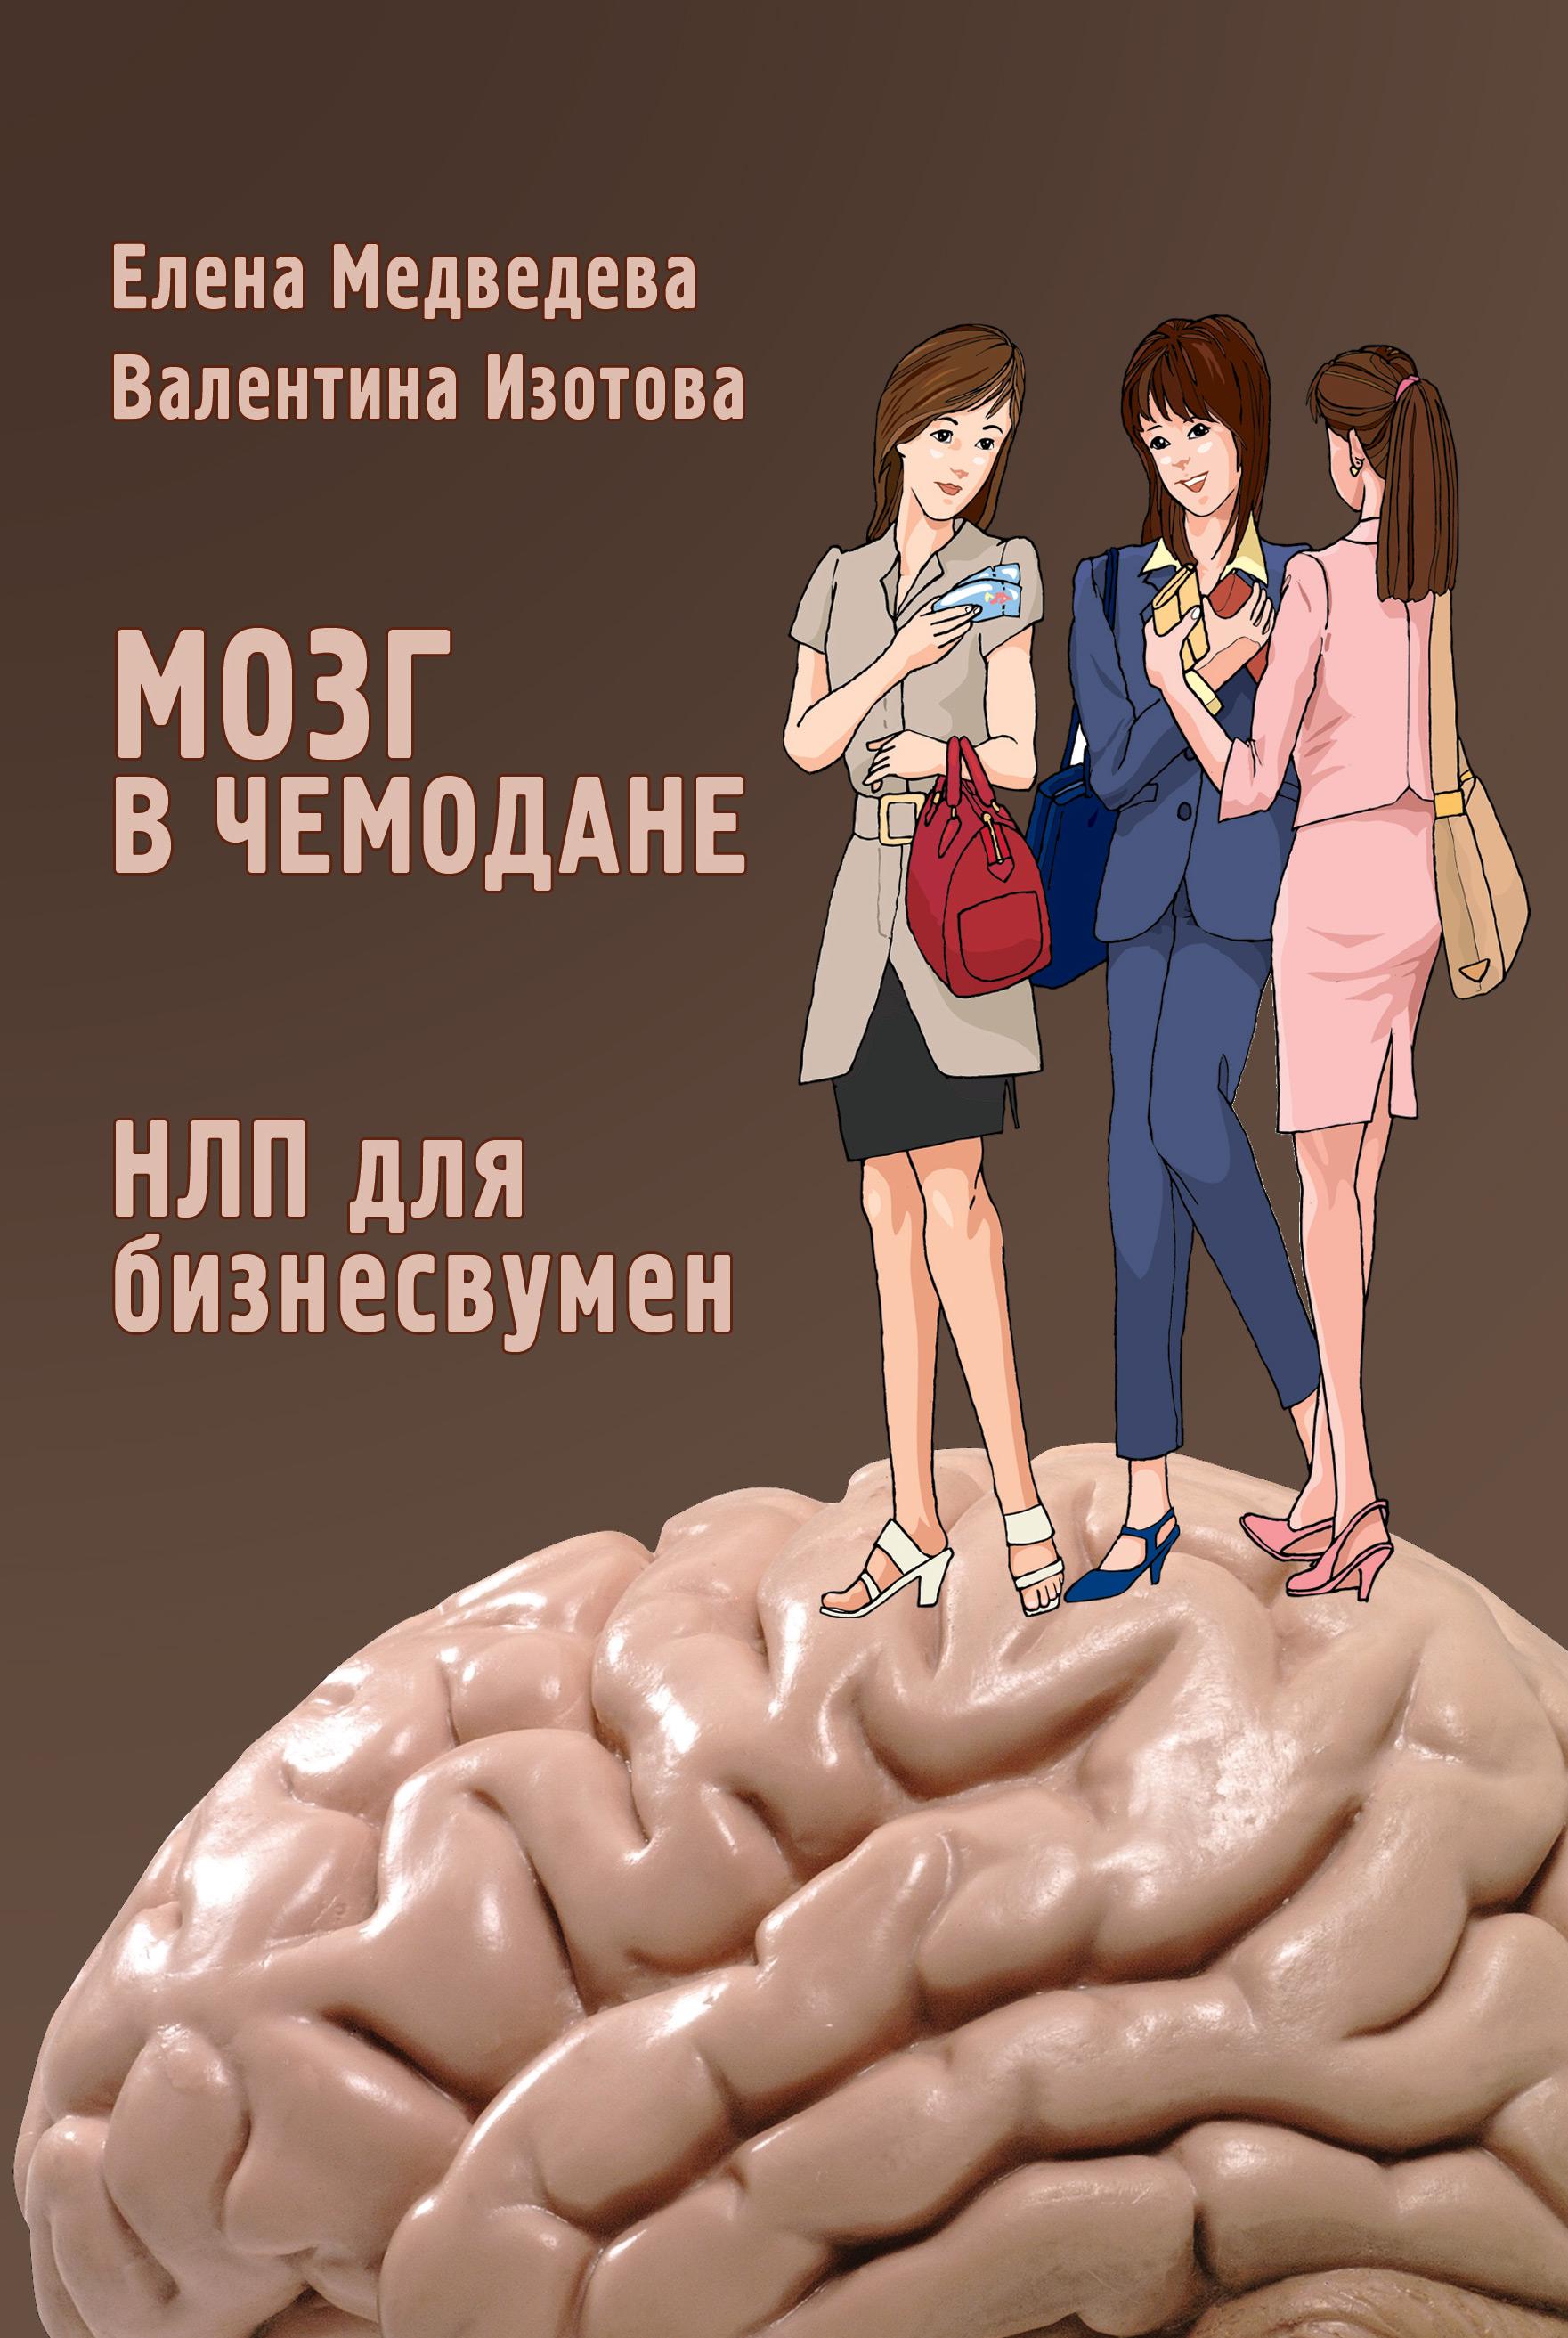 Мозг в чемодане. НЛП для бизнесвумен